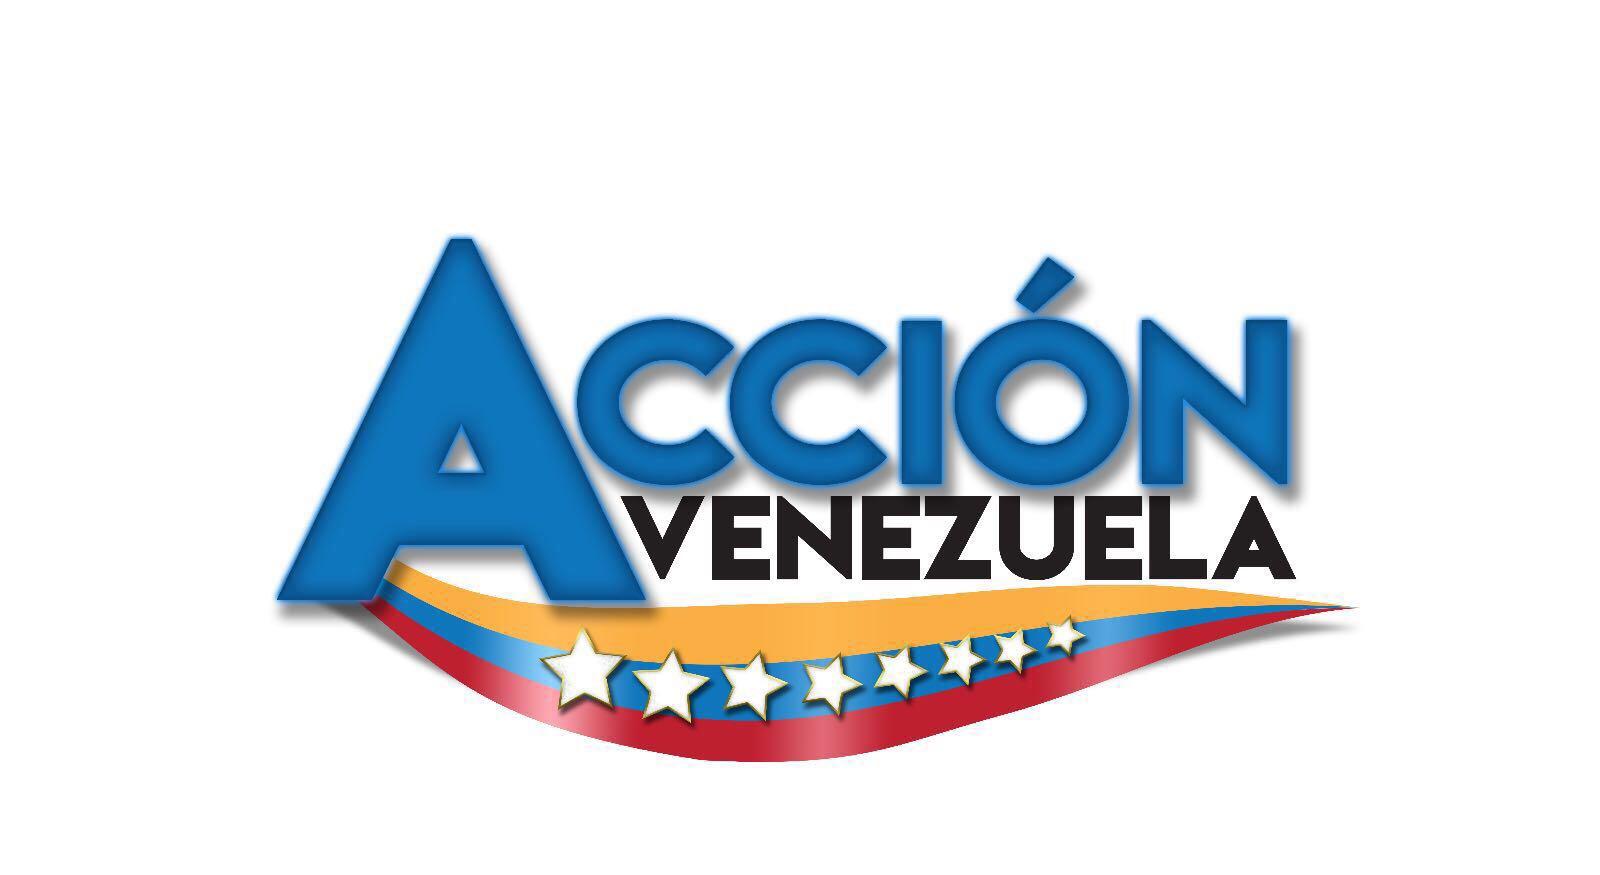 ACCIÓN VENEZUELA 2017 DIRiected byEL VENEZOLANO TV  Focuses on supporting COMMUNITAS DEI ASSOCIATION AND ITS HUMANITARIAN AID PROGRAMS.  APORTA TU GRANIO DE ARENA AQUI